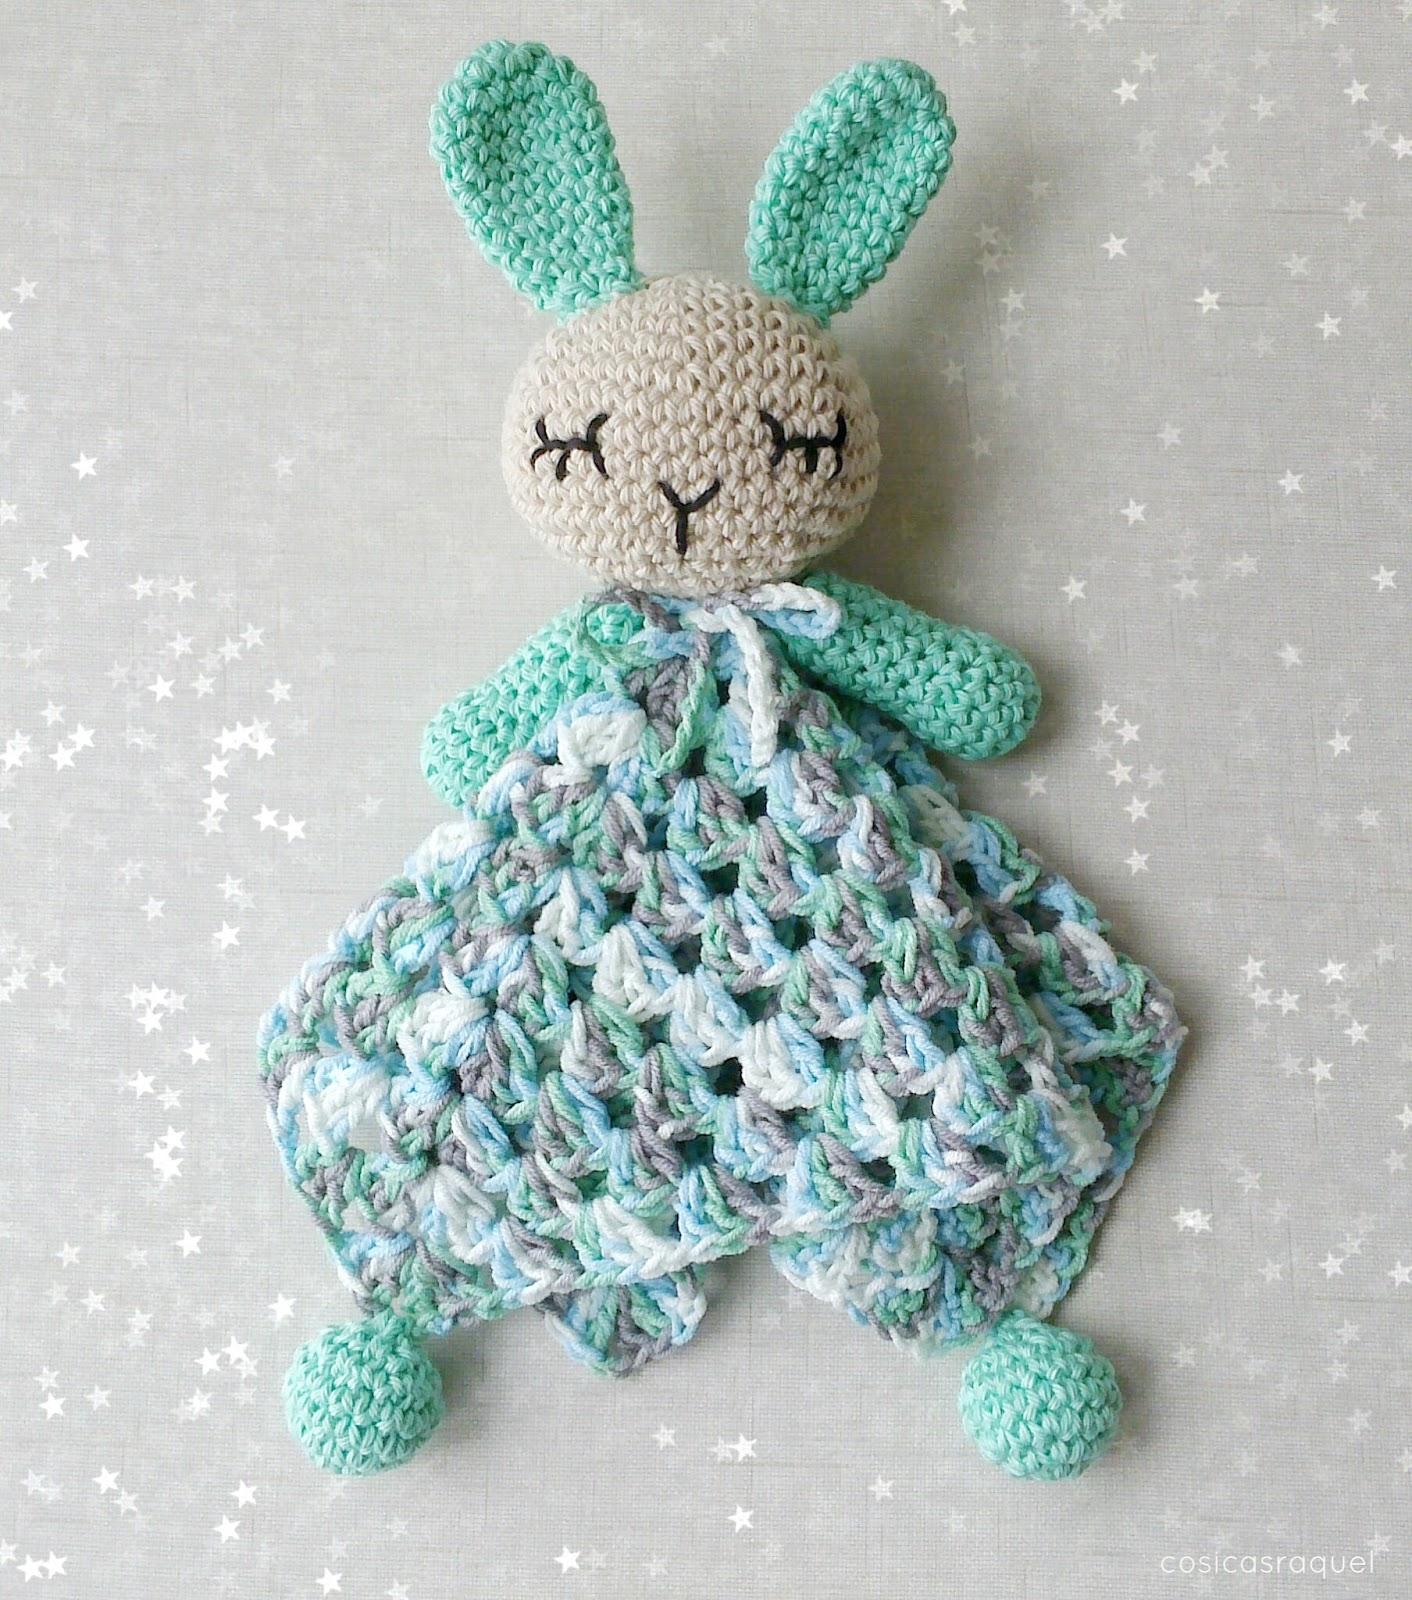 Cosicasraquel manta de apego crochet - Manta de crochet facil ...